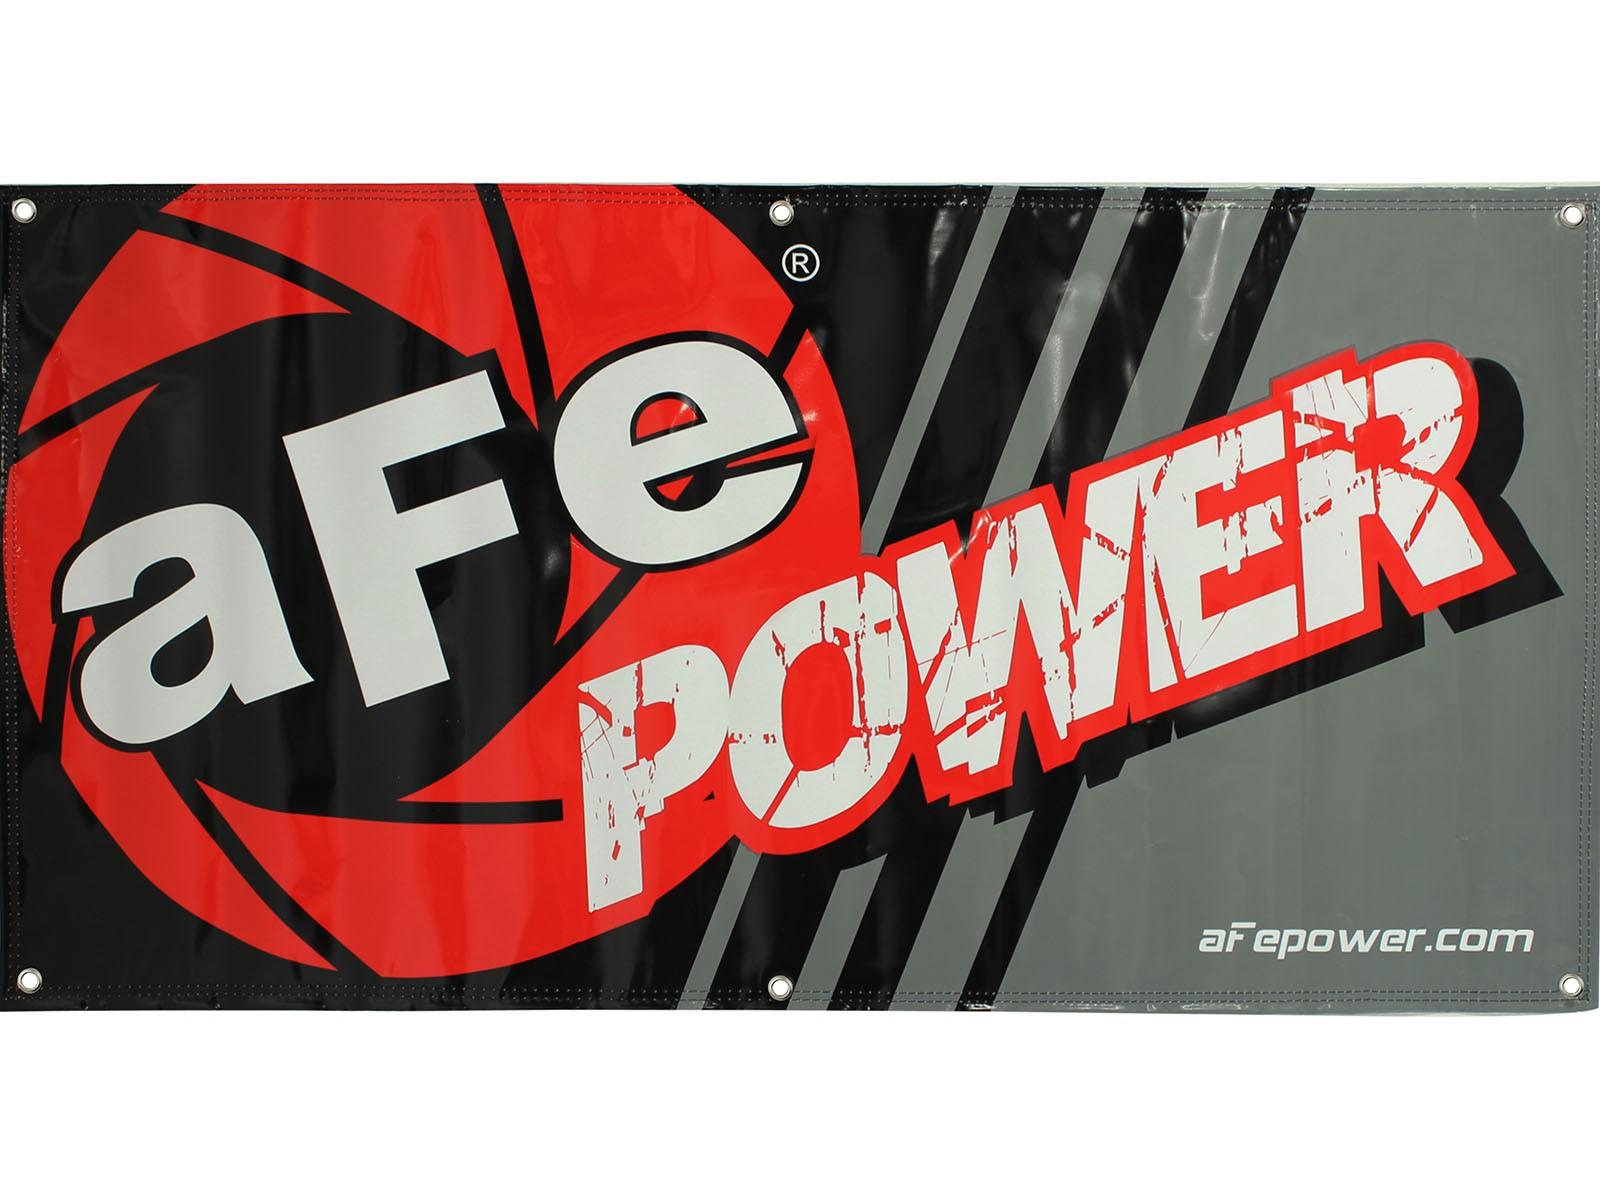 aFe POWER 40-10038 Banner, 3' x 8' ft.; aFe Power